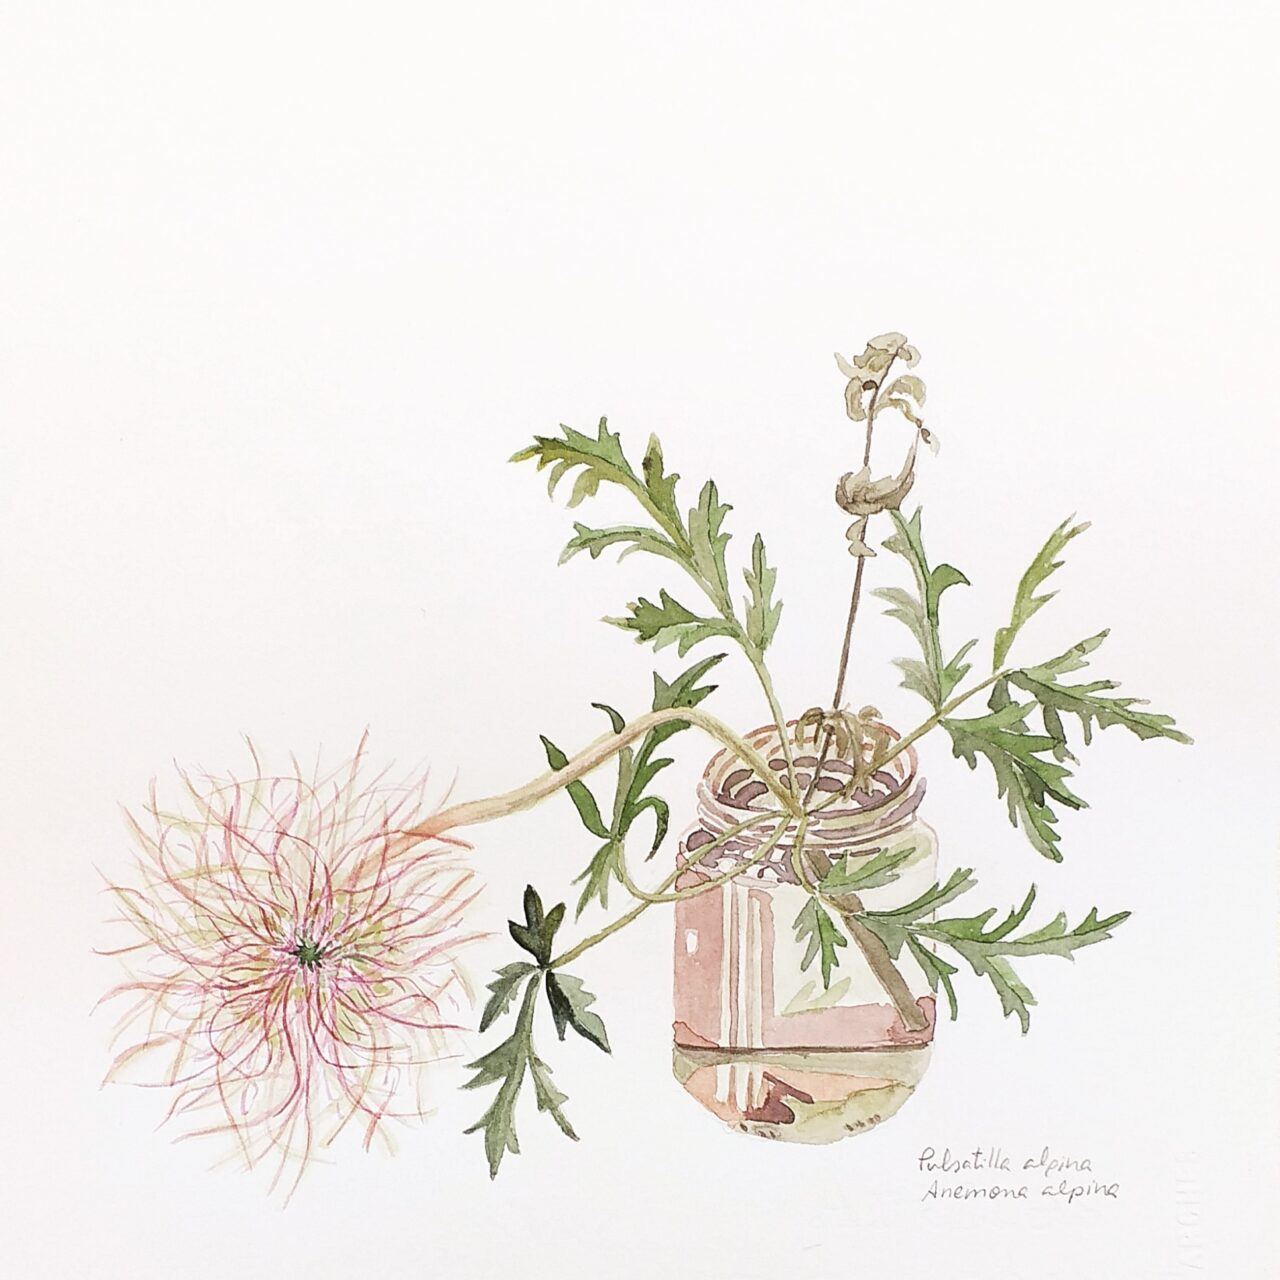 Pulsatilla alpina Anemone alpina - Anémona silvestre - Alpine anemone